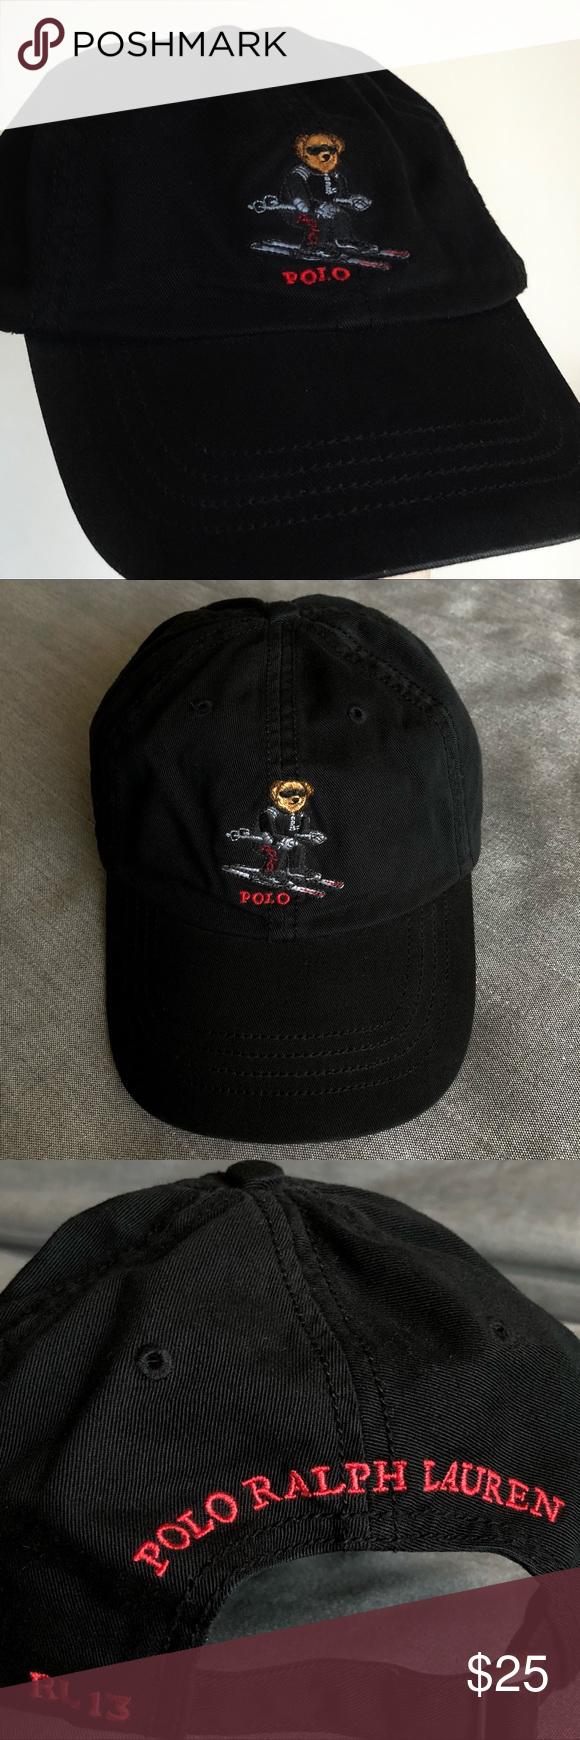 70961796 Polo Ralph Lauren RL13 Hat Retro Polo by Ralph Lauren 6 panel baseball hat/ cap